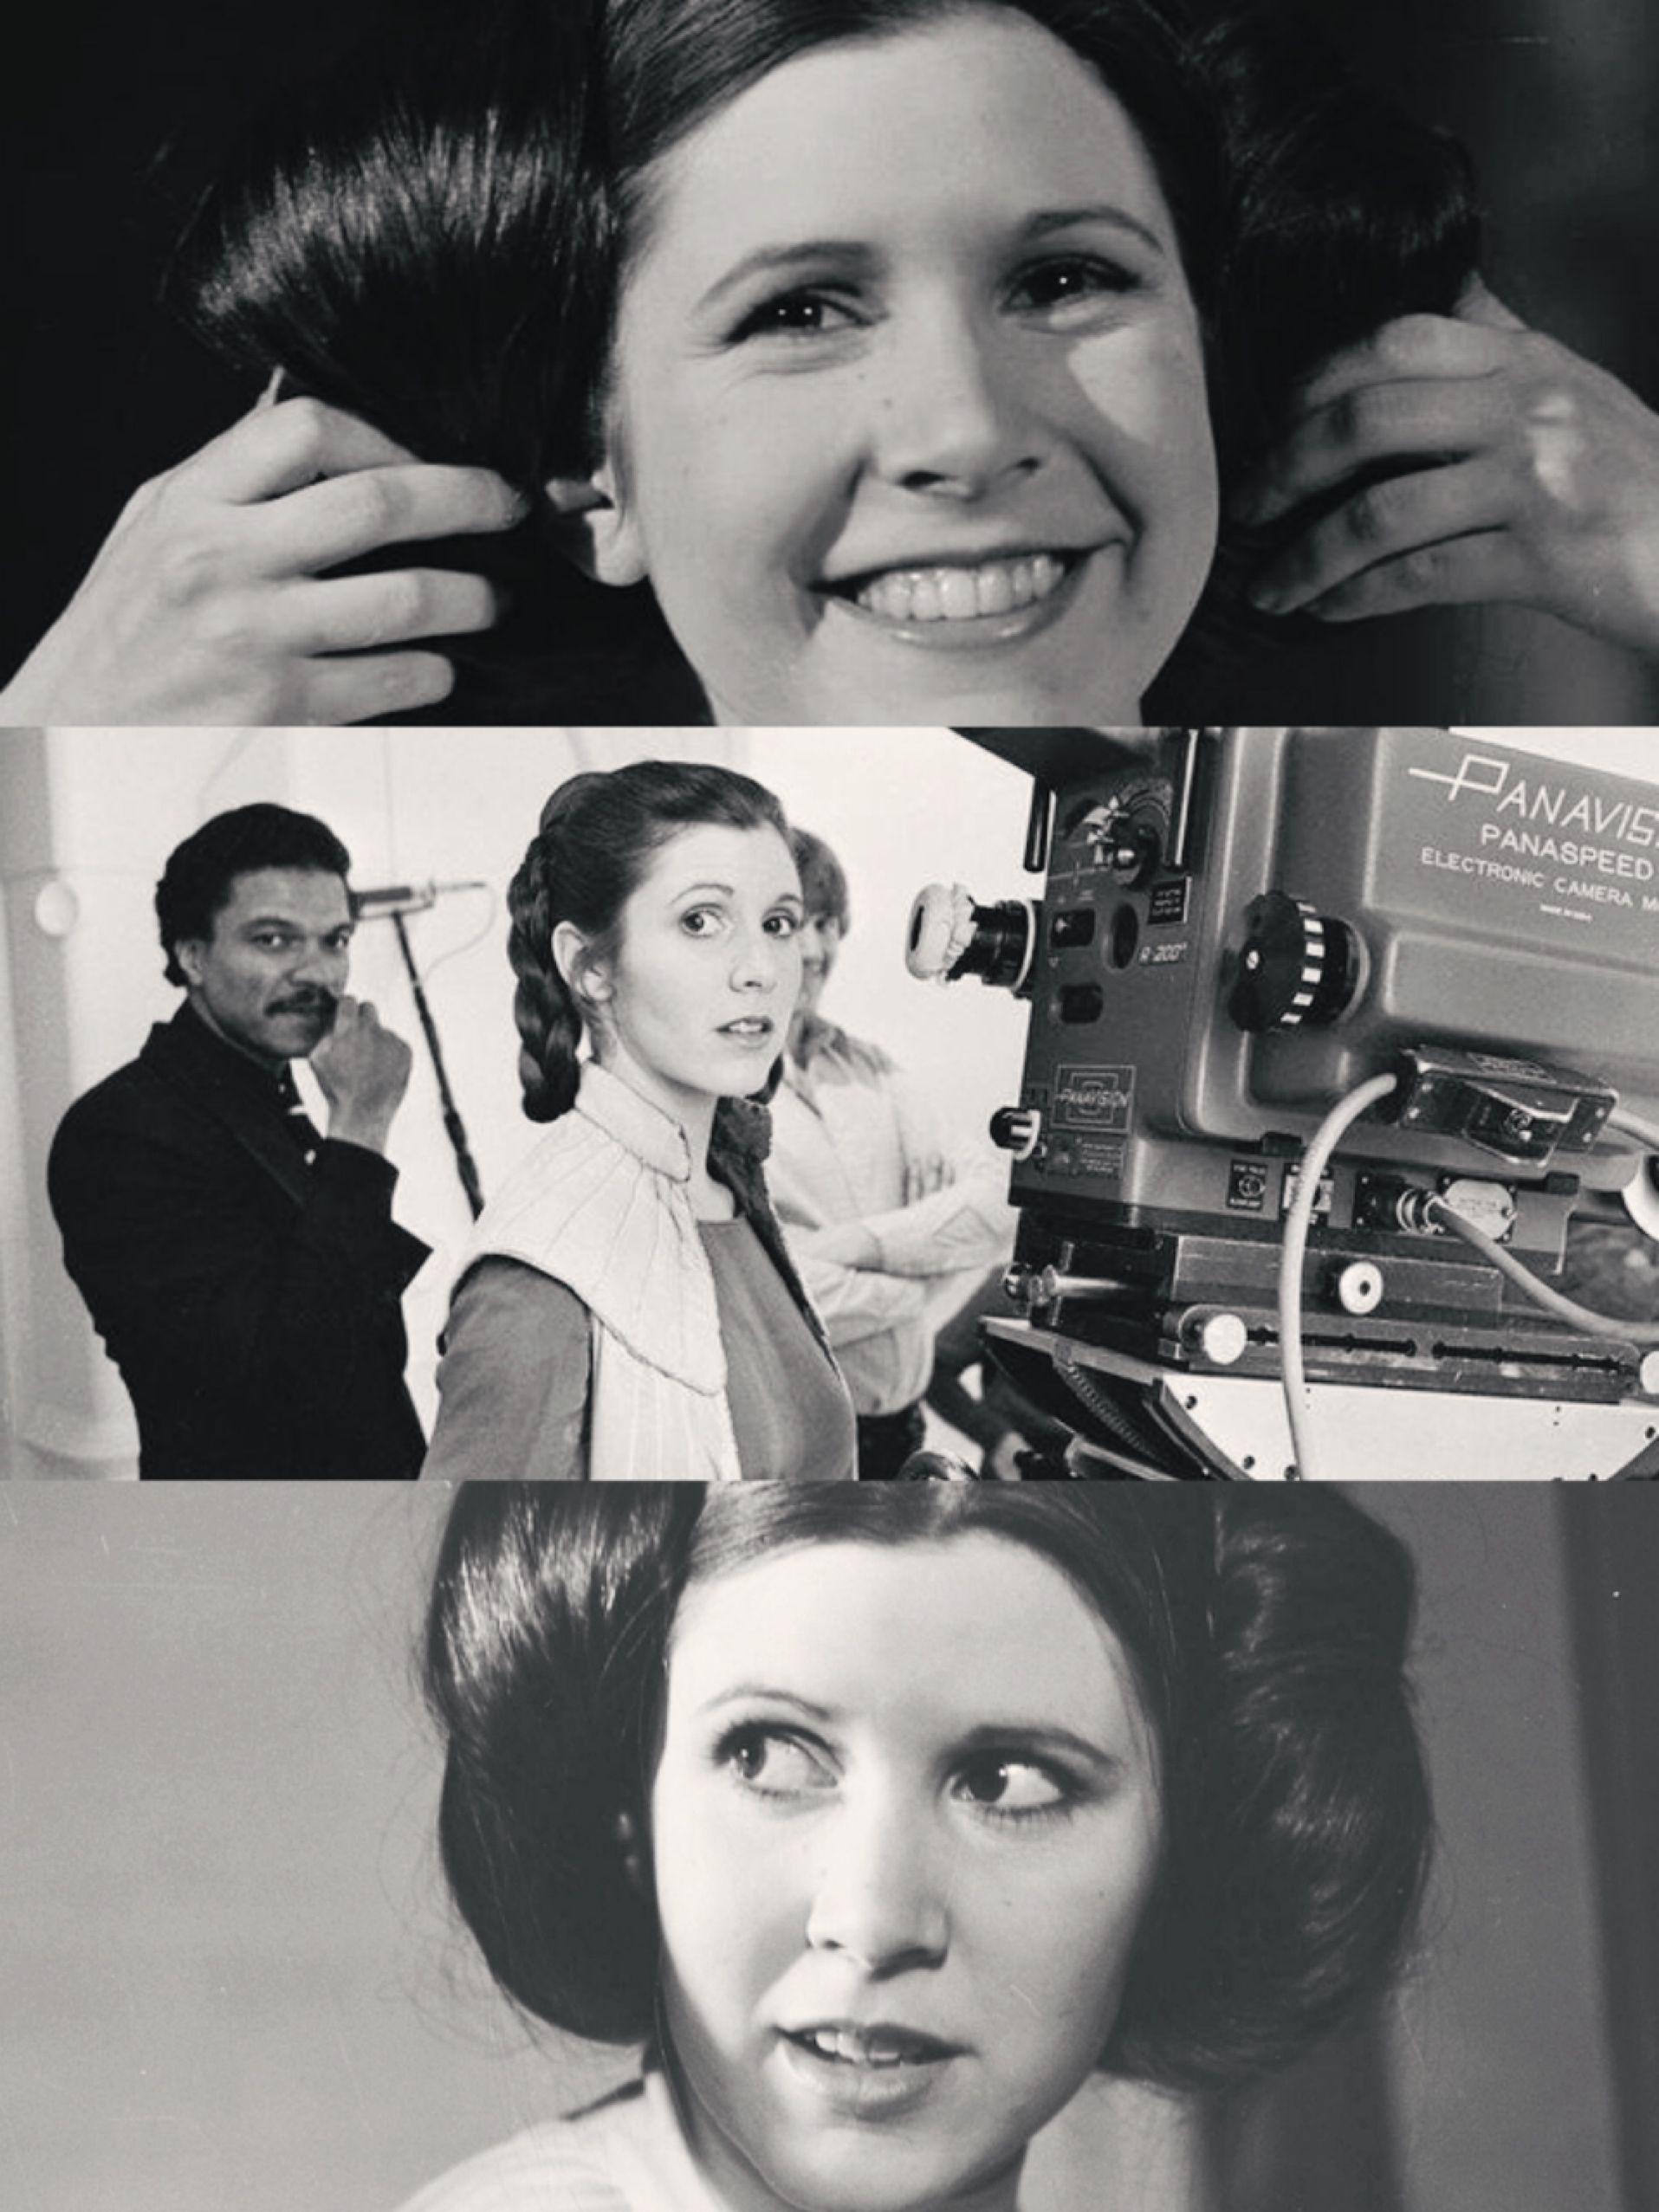 Leia Wallpaper Iphone Carrie Fisher Vintage Star Wars Star Wars Watch